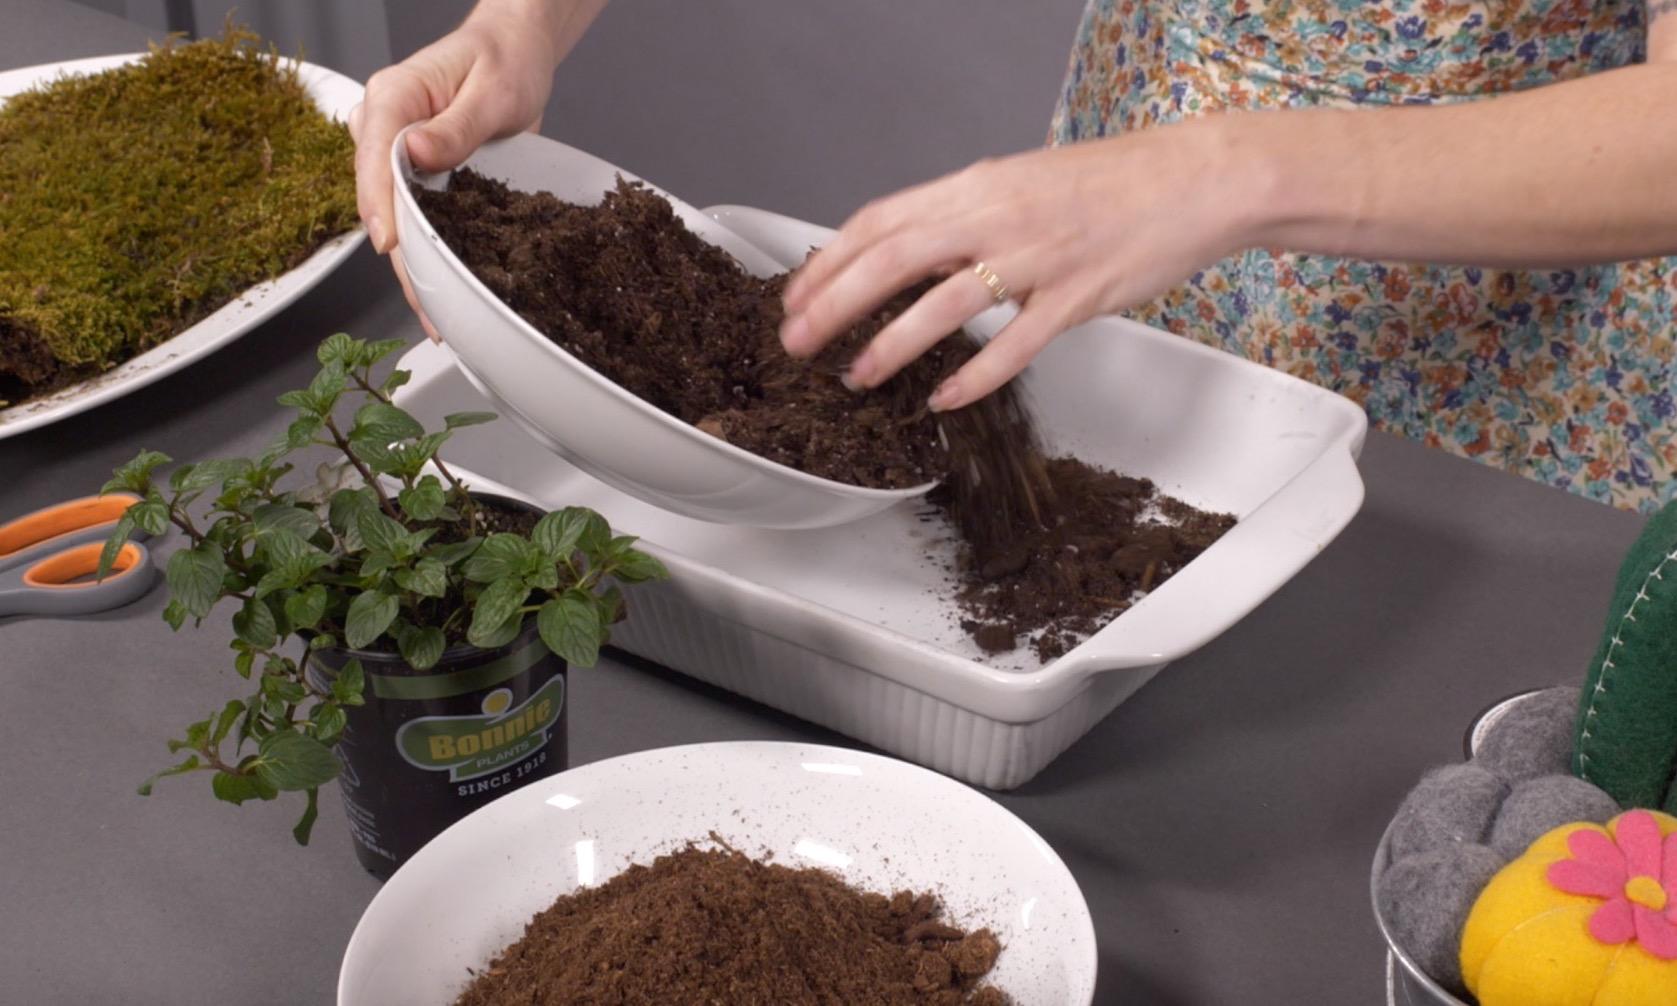 mix together bonsai soil and peat moss to make a kokedama